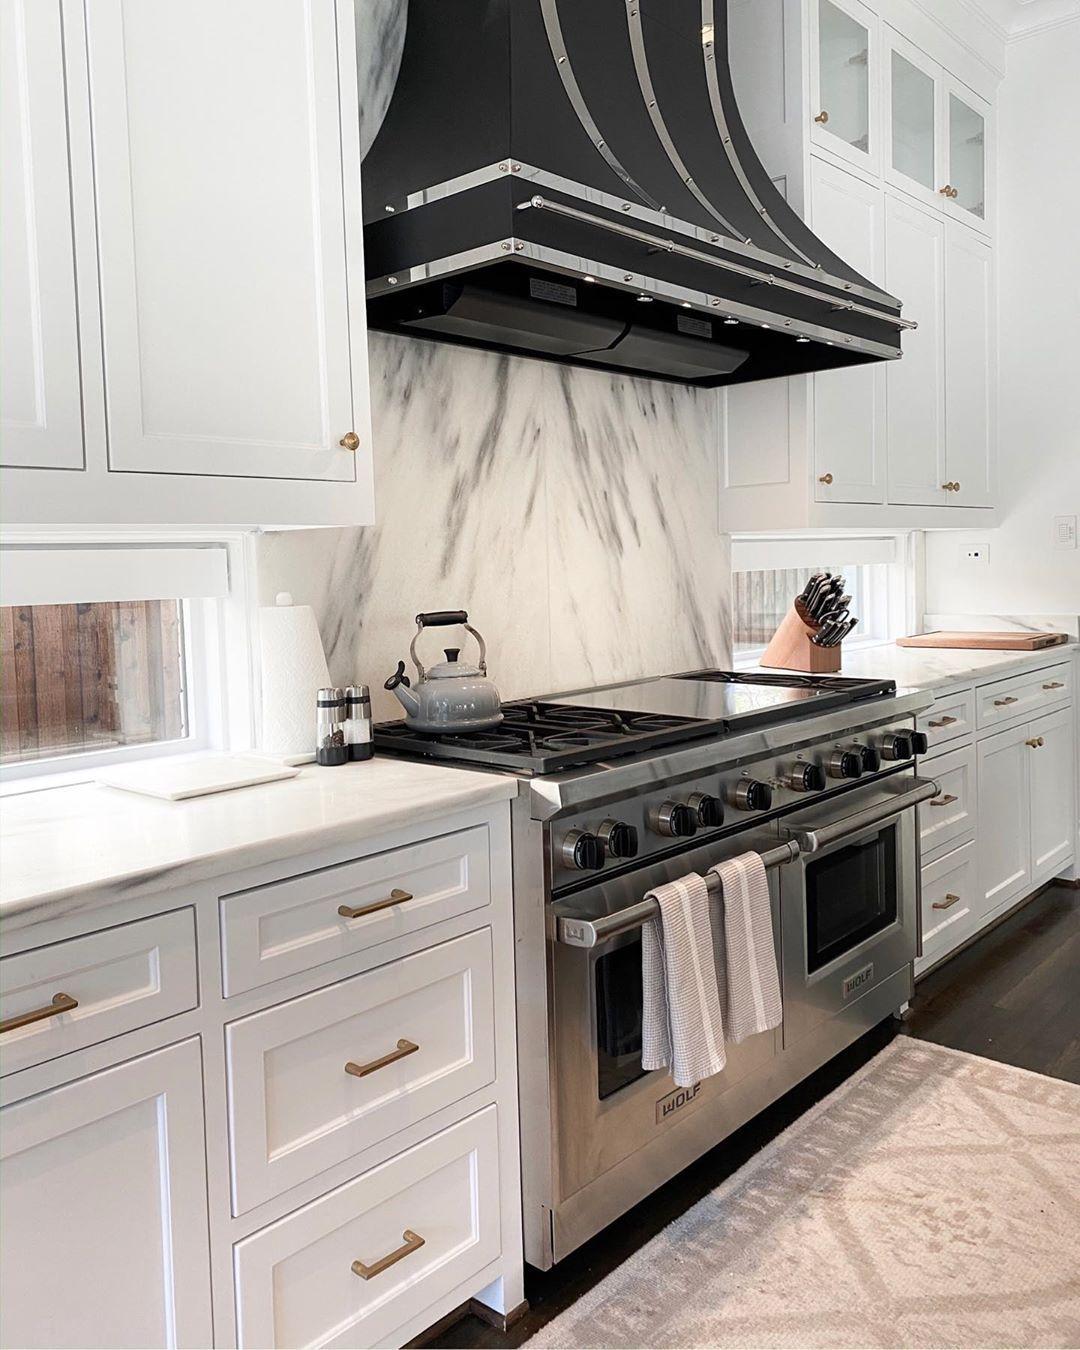 Krystal Schlegel Davis On Instagram Sunday Morning At Home Posted Our Most Used Kitchen Items On Krystalschlegel Com Http Liketk It 2k7mi Liketoknow 2020